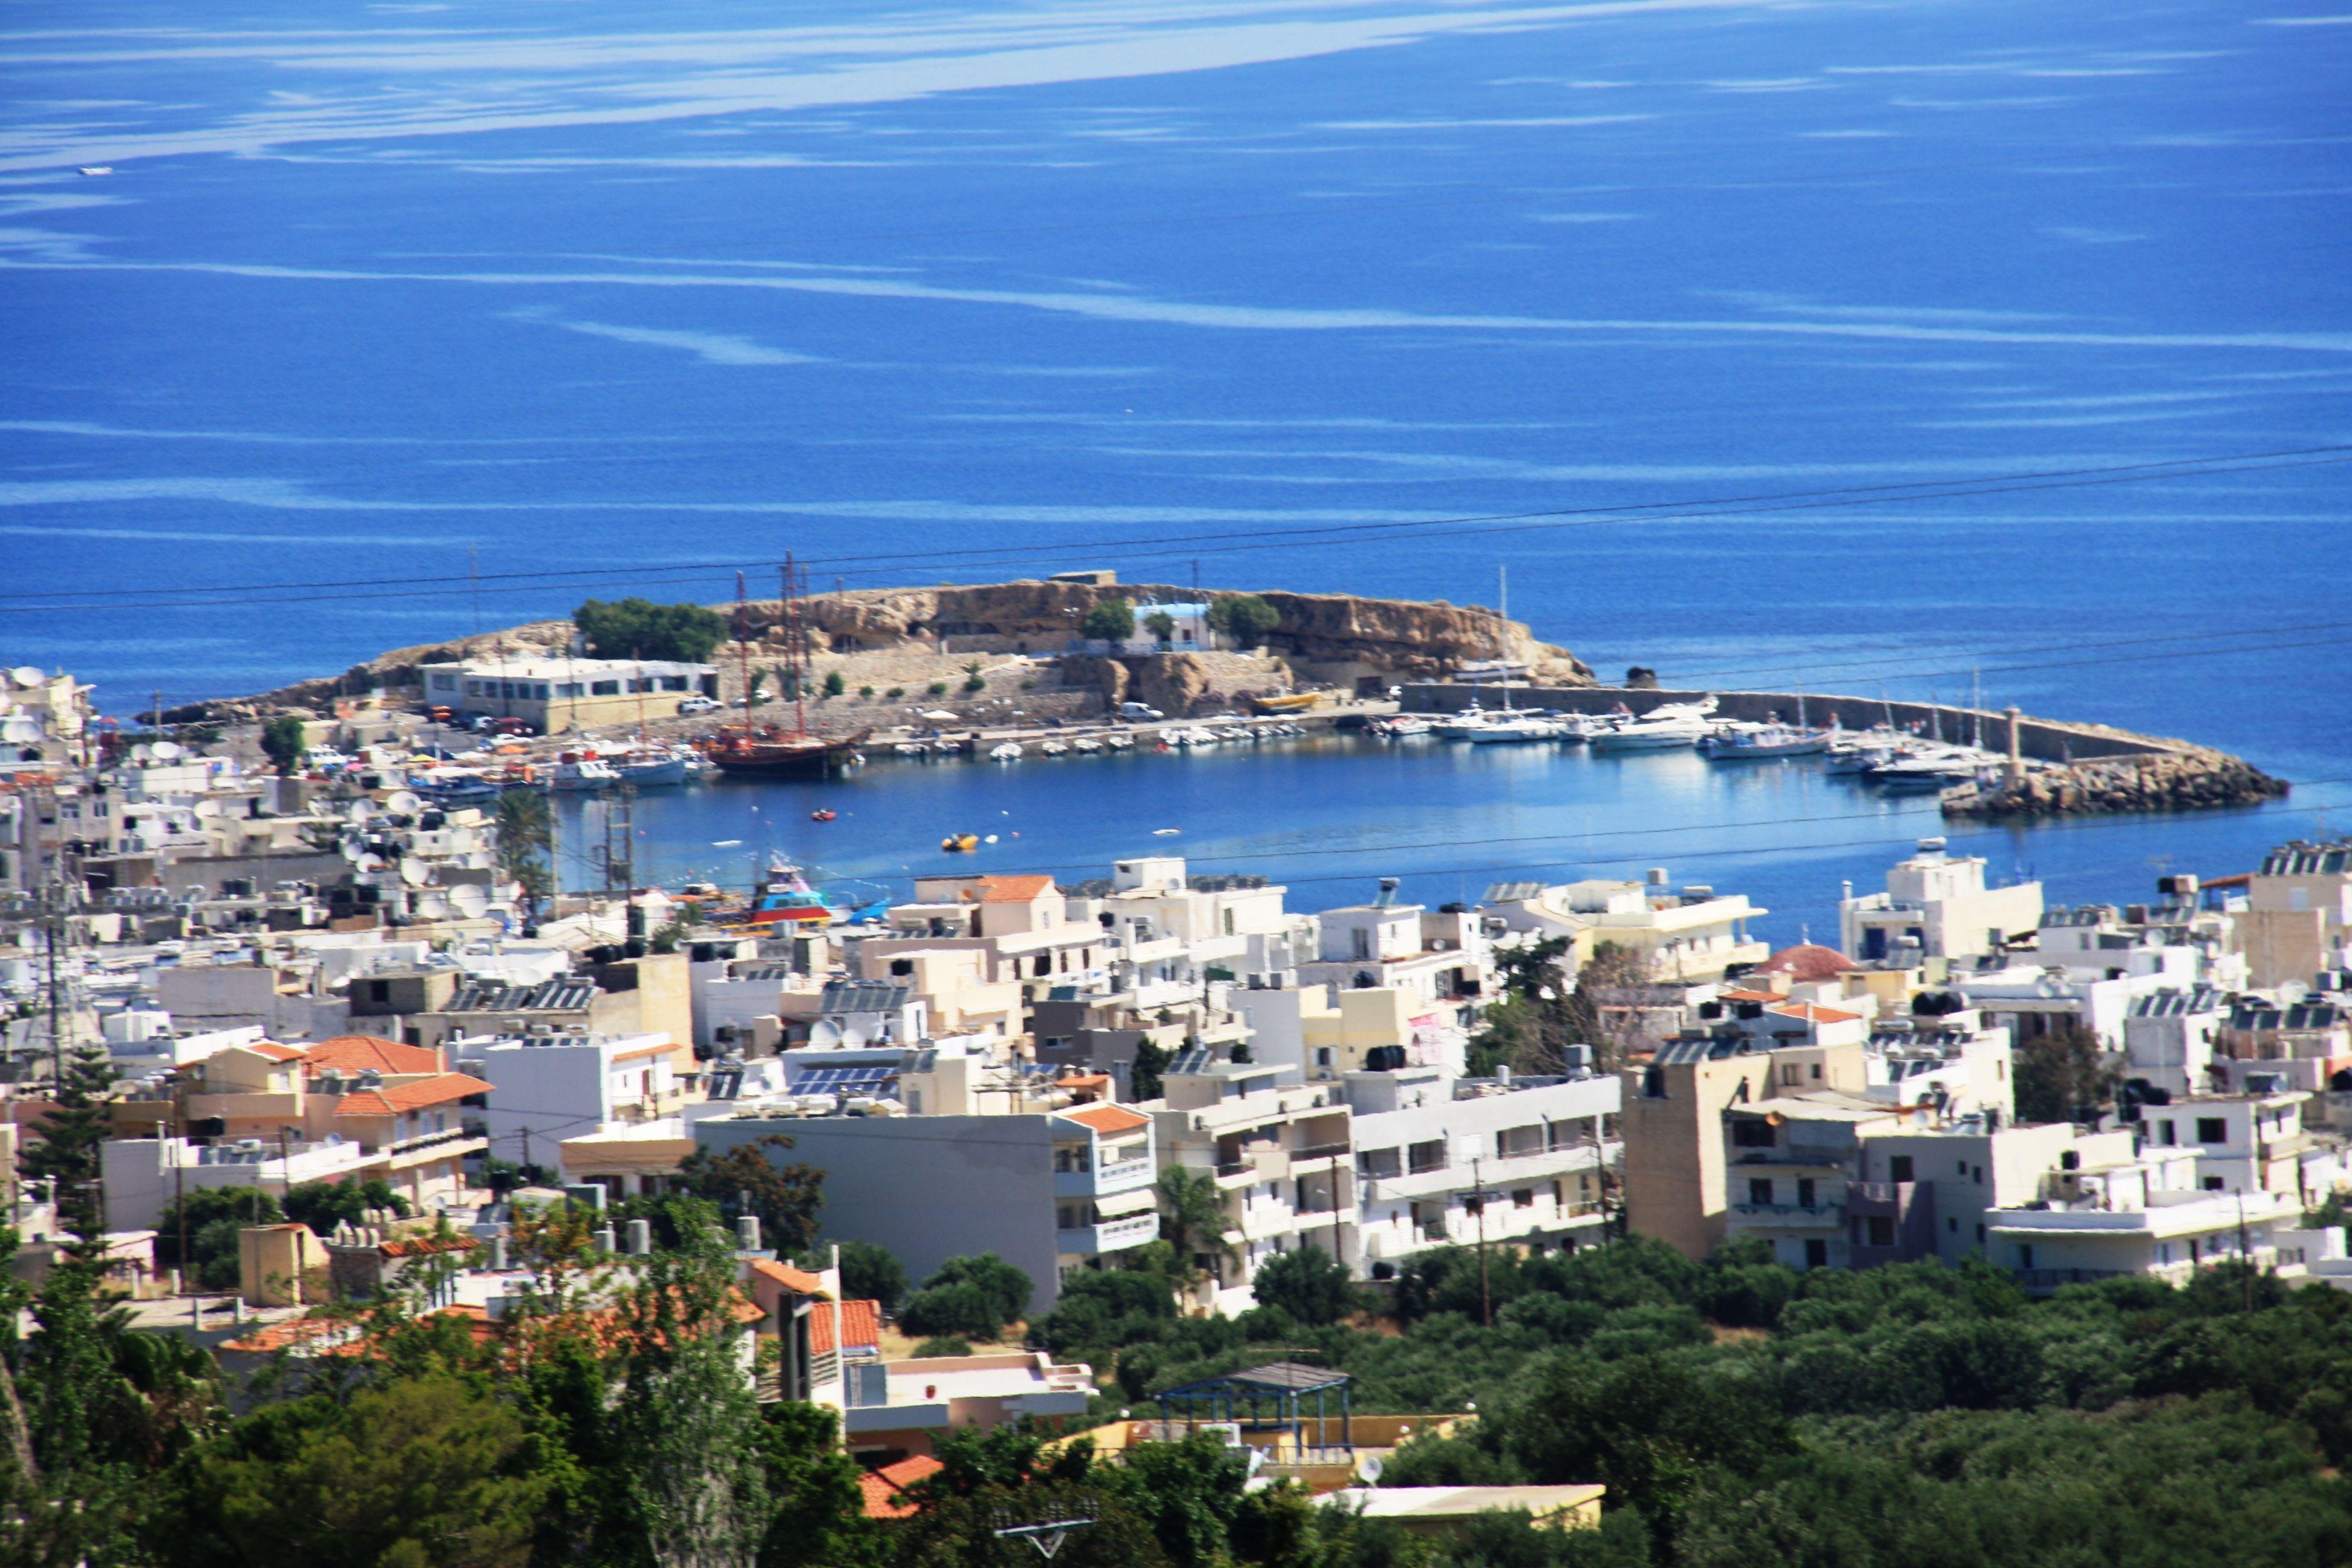 Hersonissos Crete Greece Link Creta Old Port Area From - Higher elevation